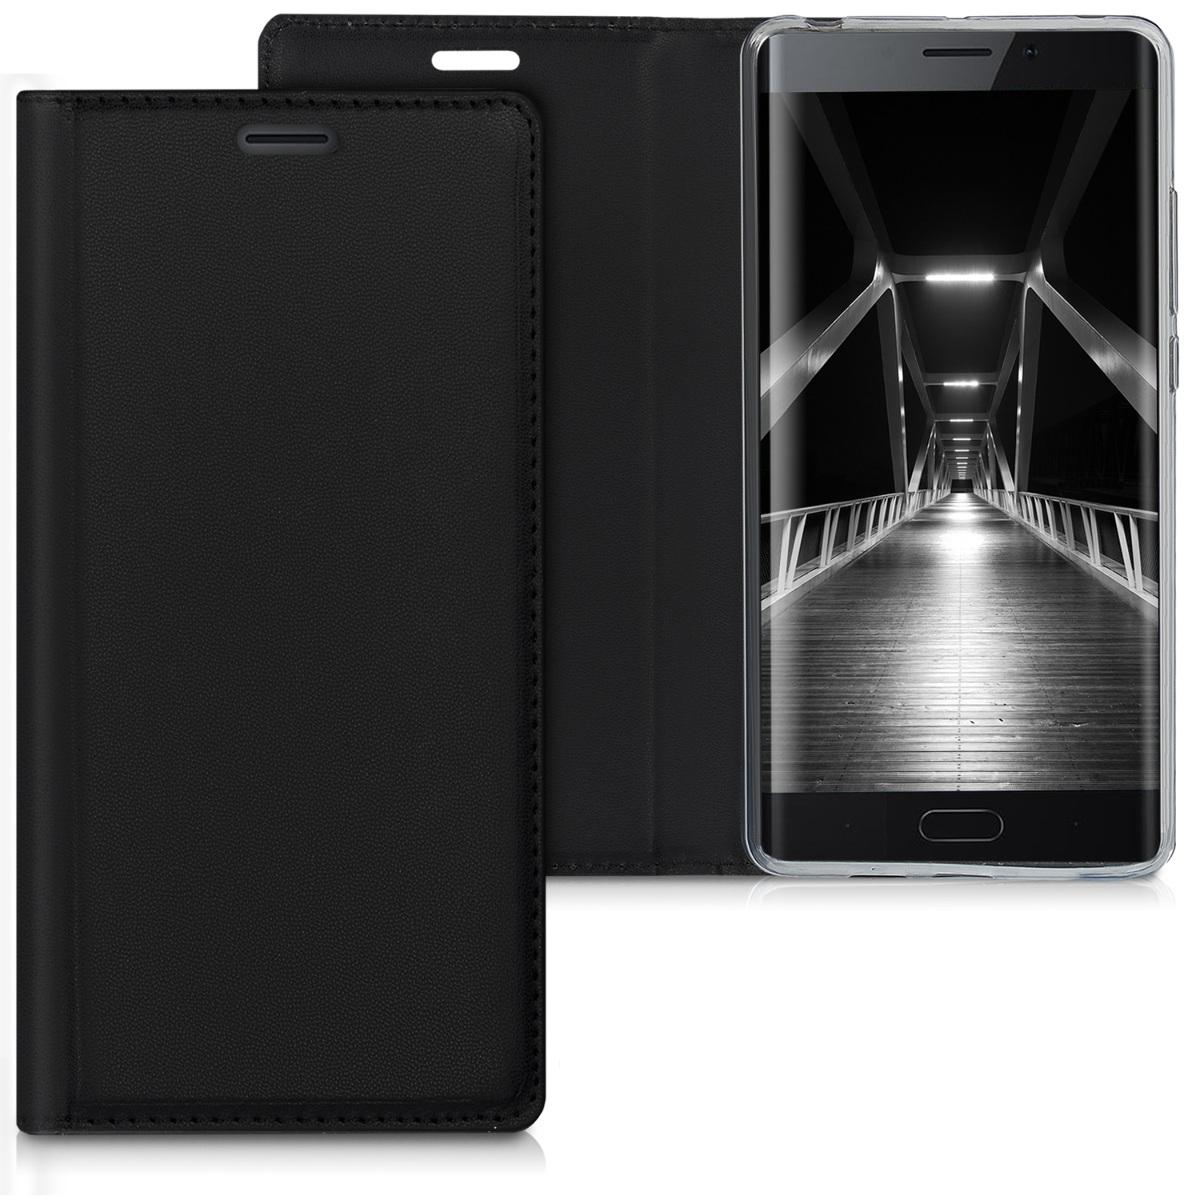 KW Θήκη-Flip για Xiaomi Mi Note 2 - Black (41538.01)